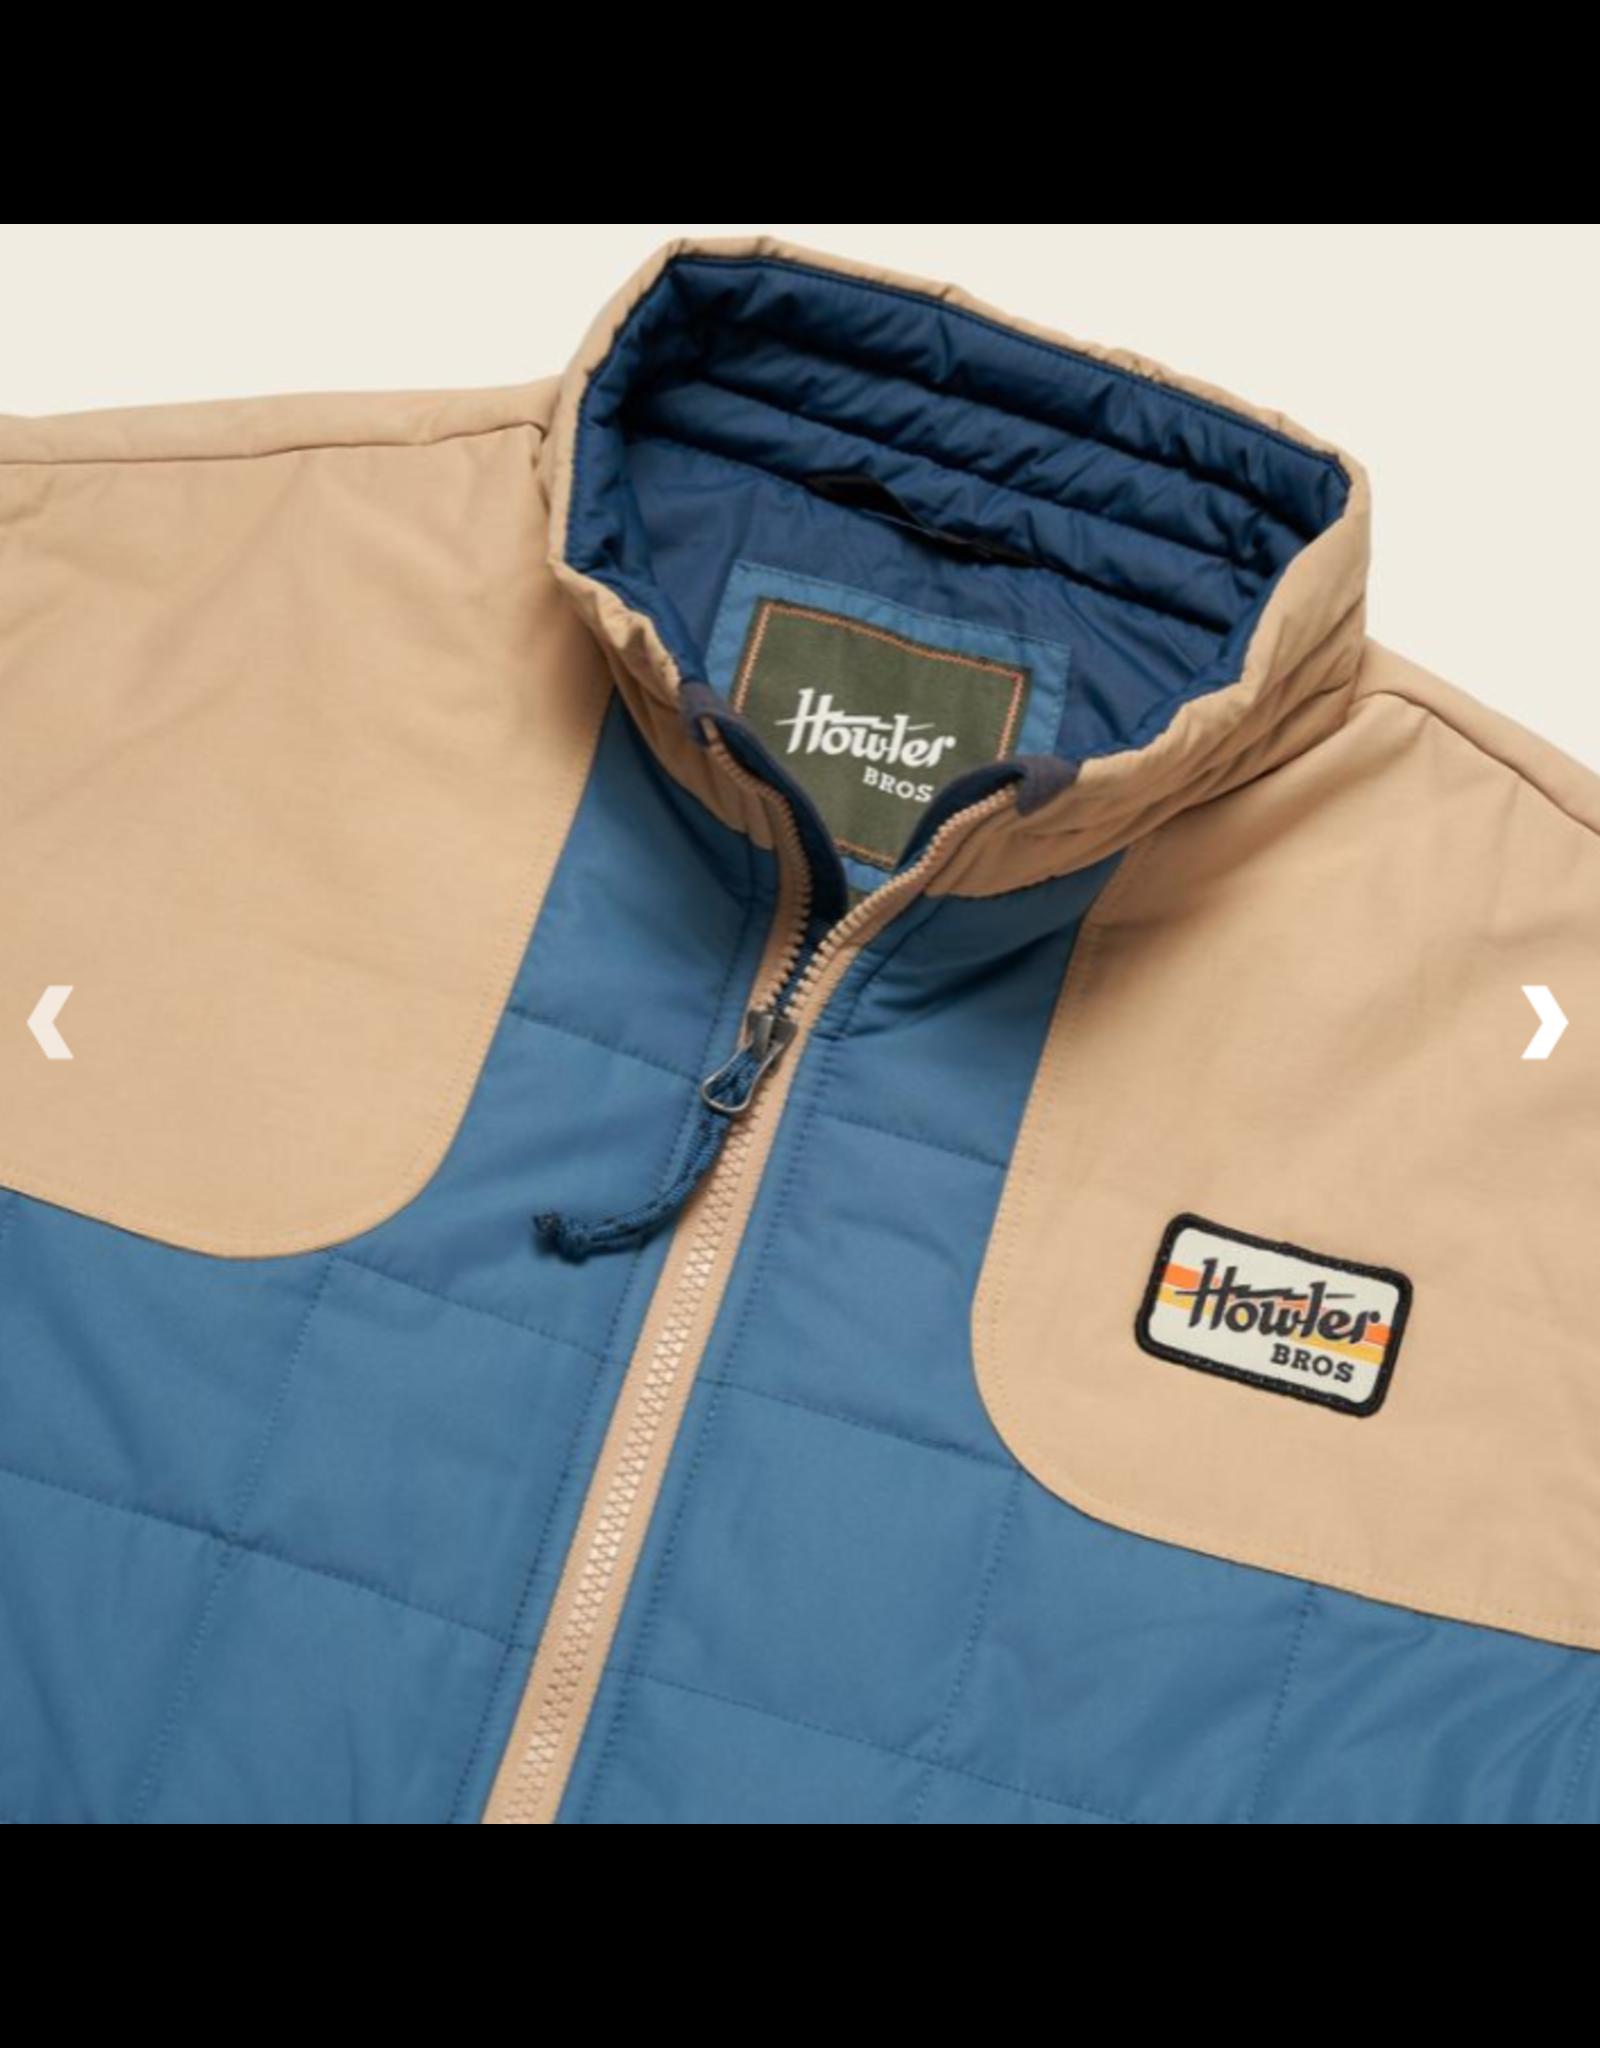 Howler HOWLER Merlin Jacket